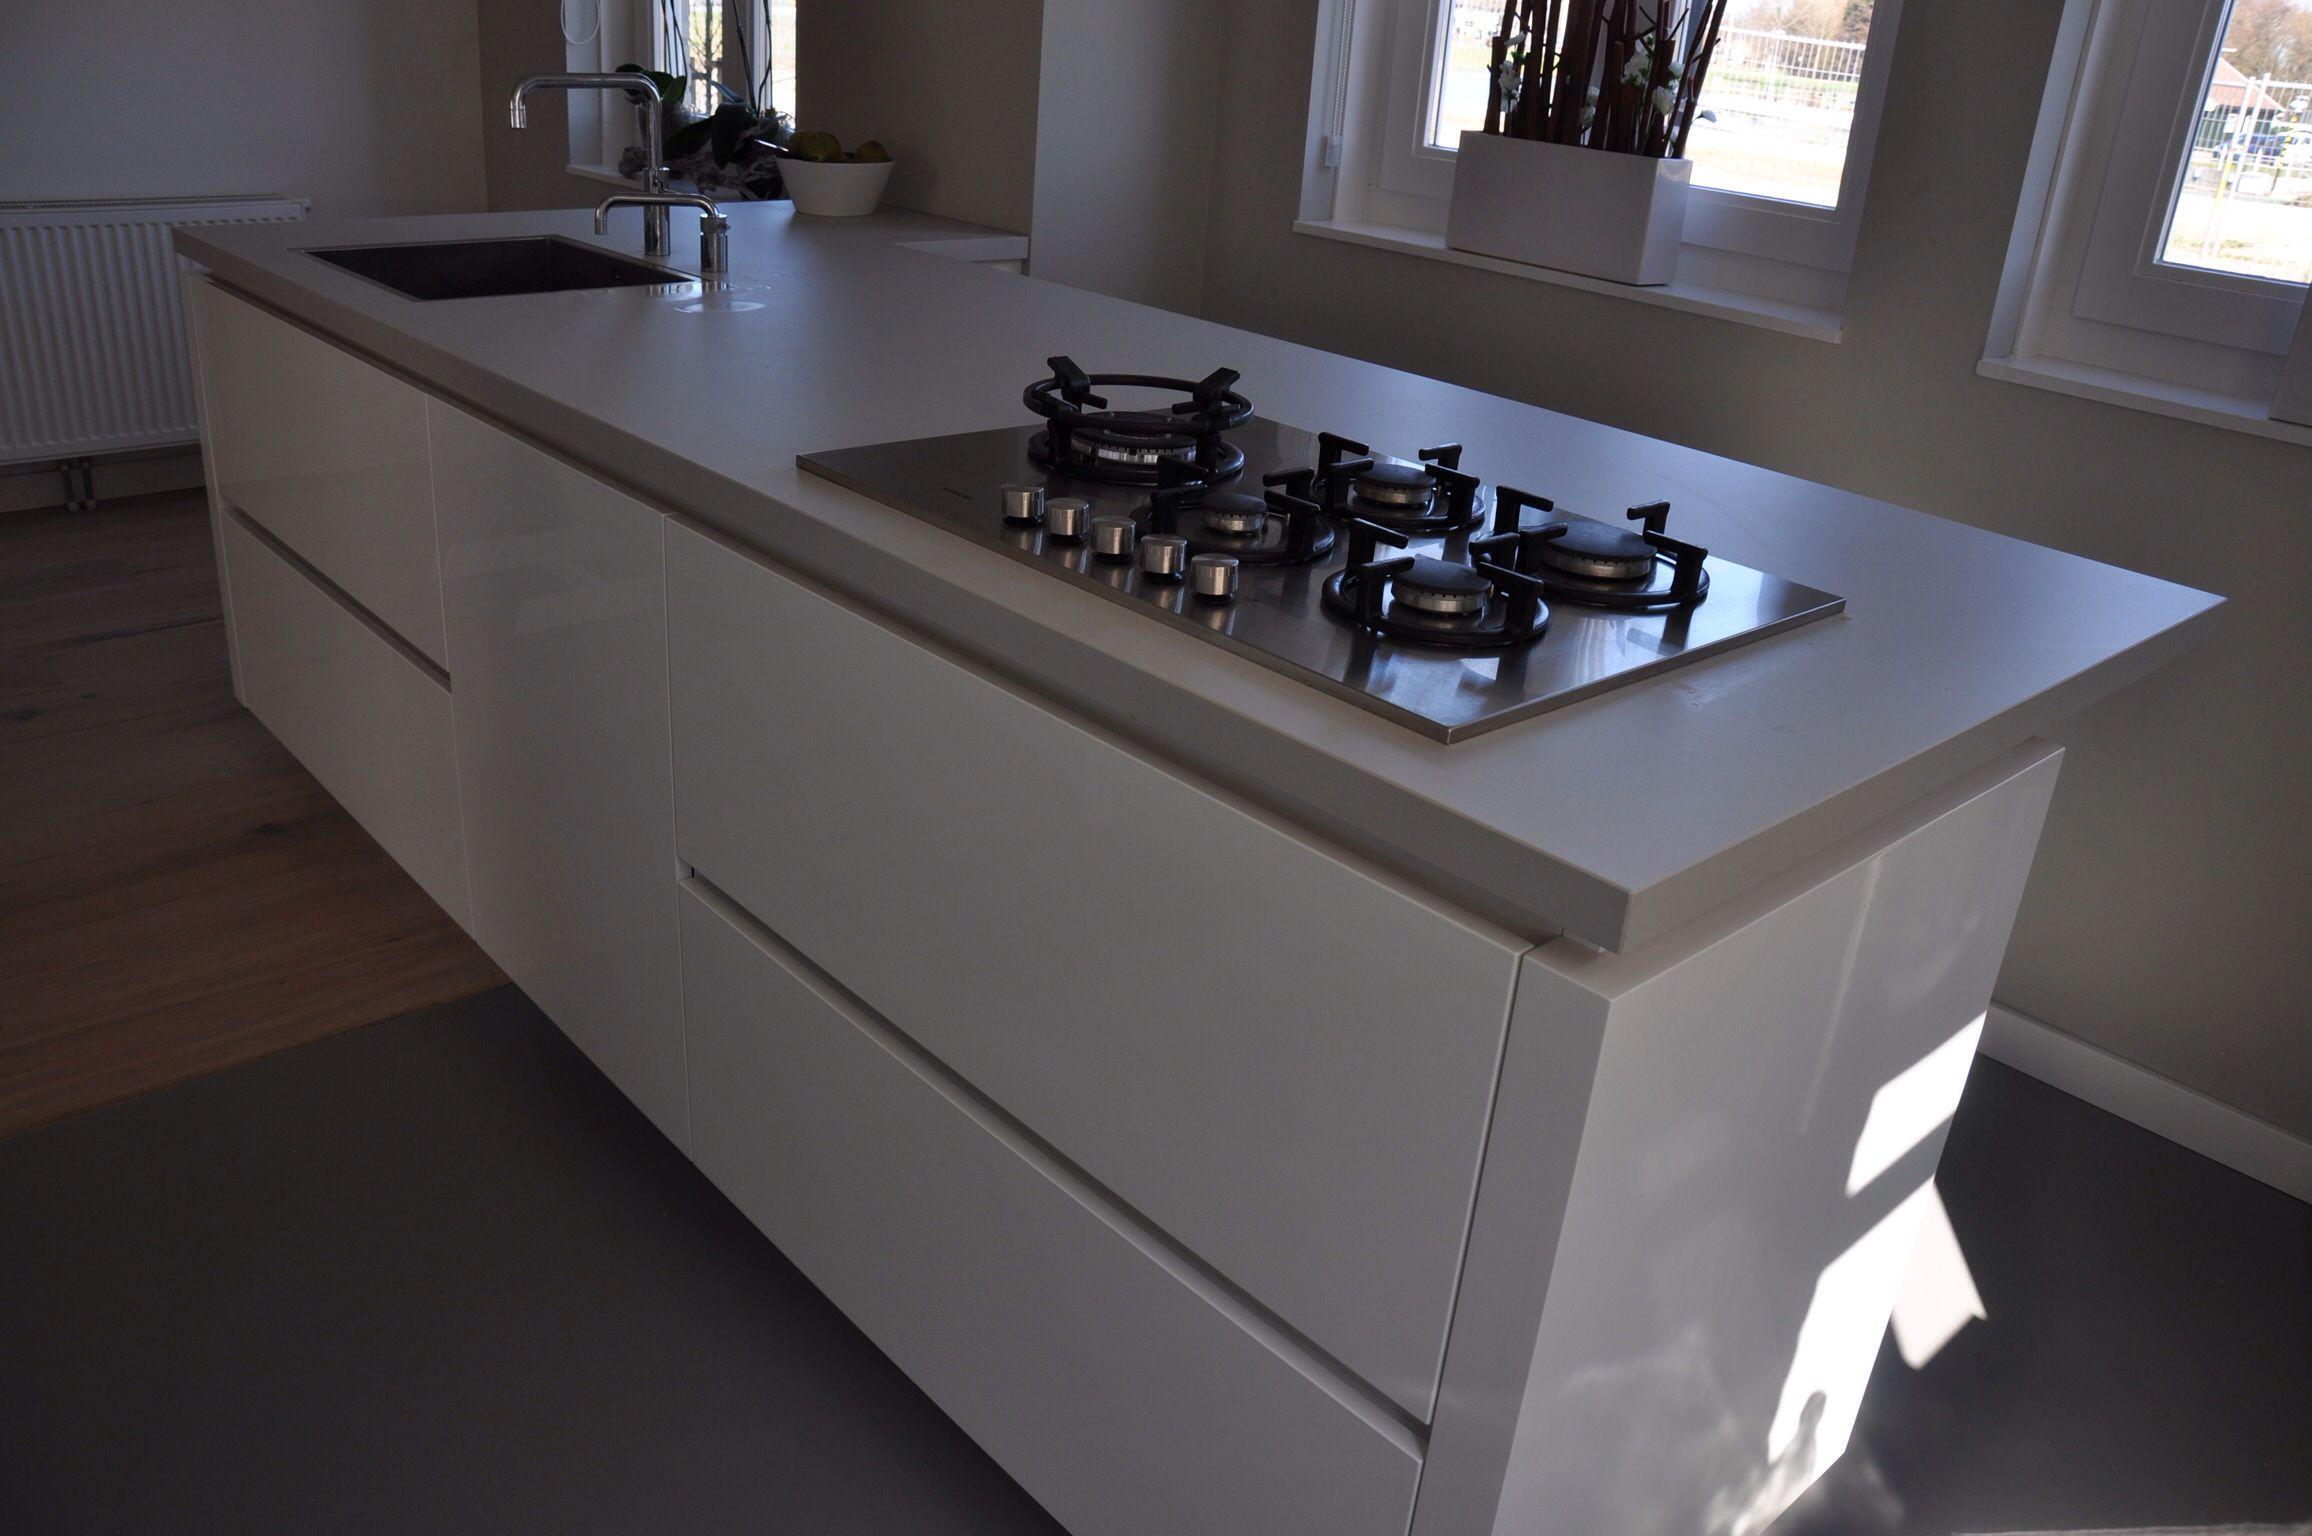 Keuken Wit Blad : Keukens Kleurtjes, Betonlook Blad, Met Betonlook, Keuken Wit Greeploos